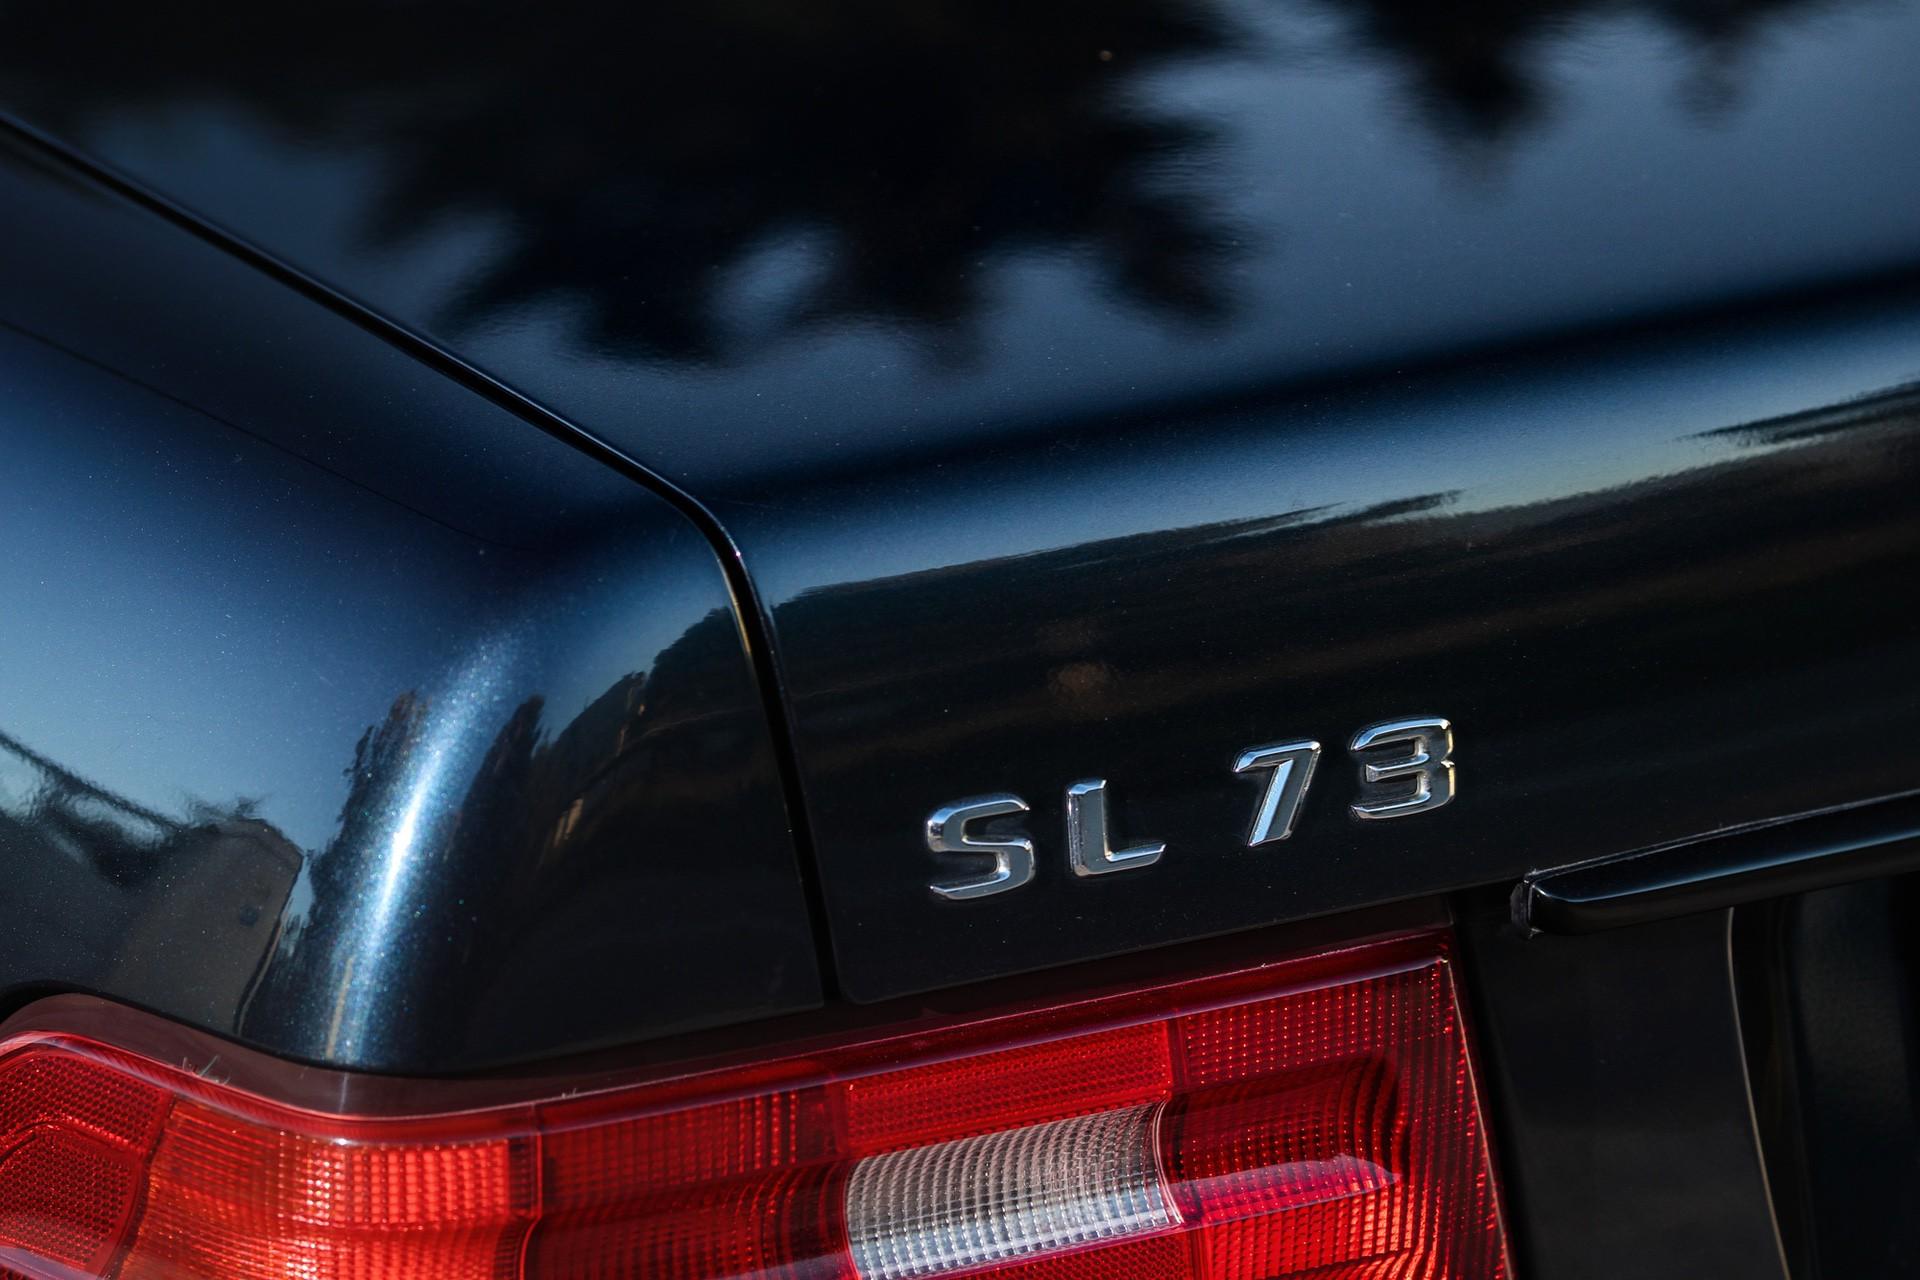 1999-Mercedes-Benz-SL-73-AMG-_62